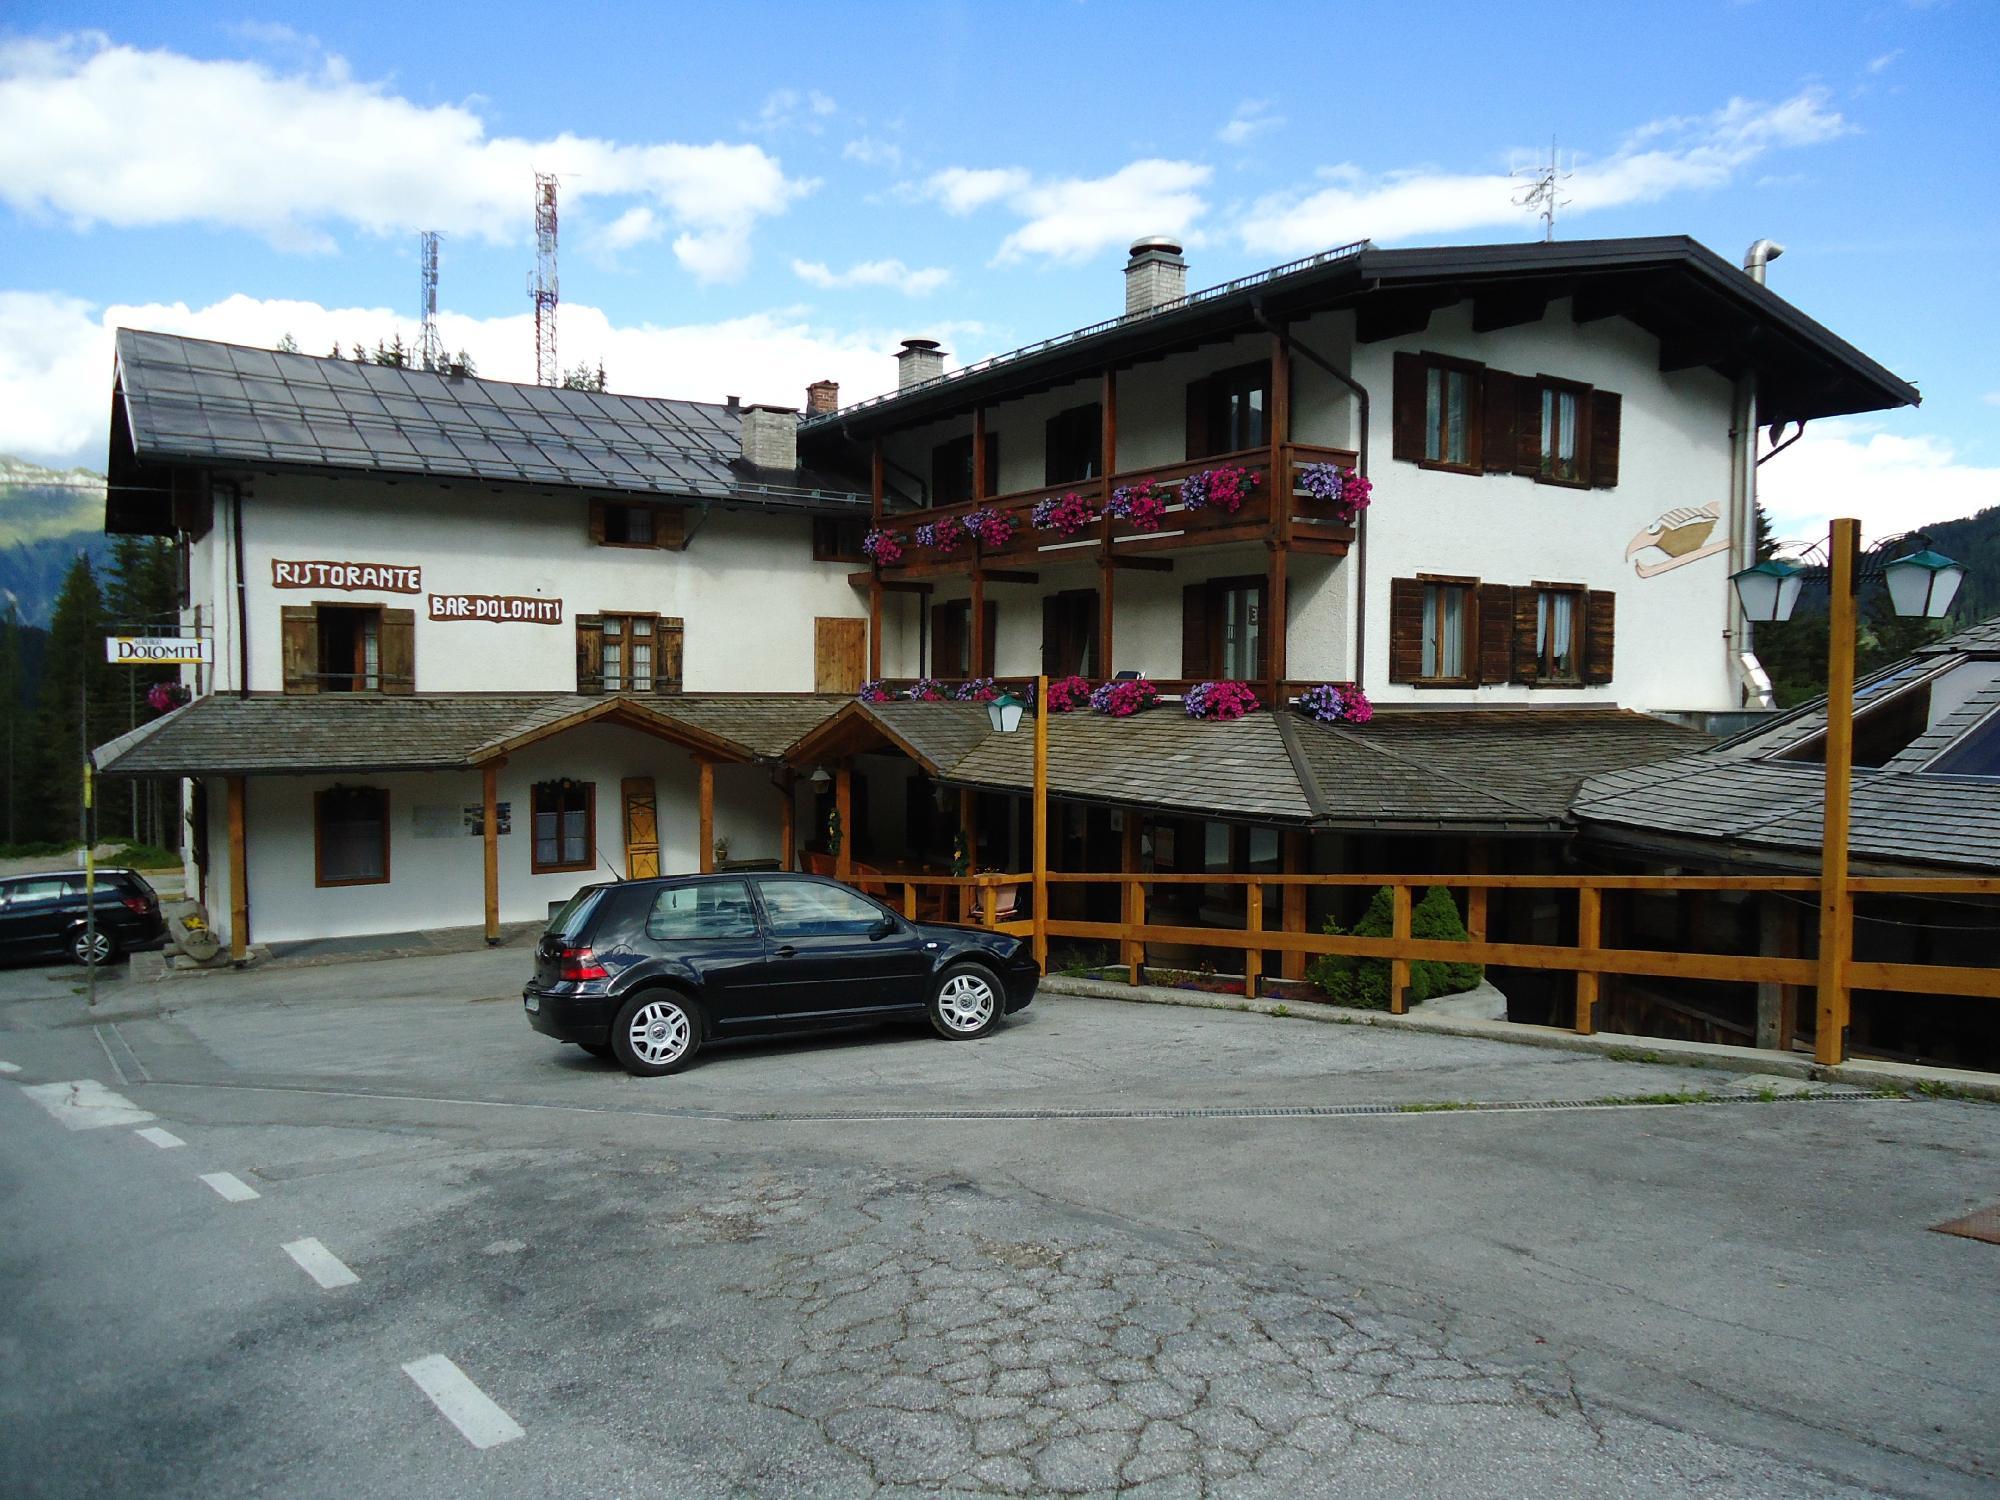 Albergo Dolomiti